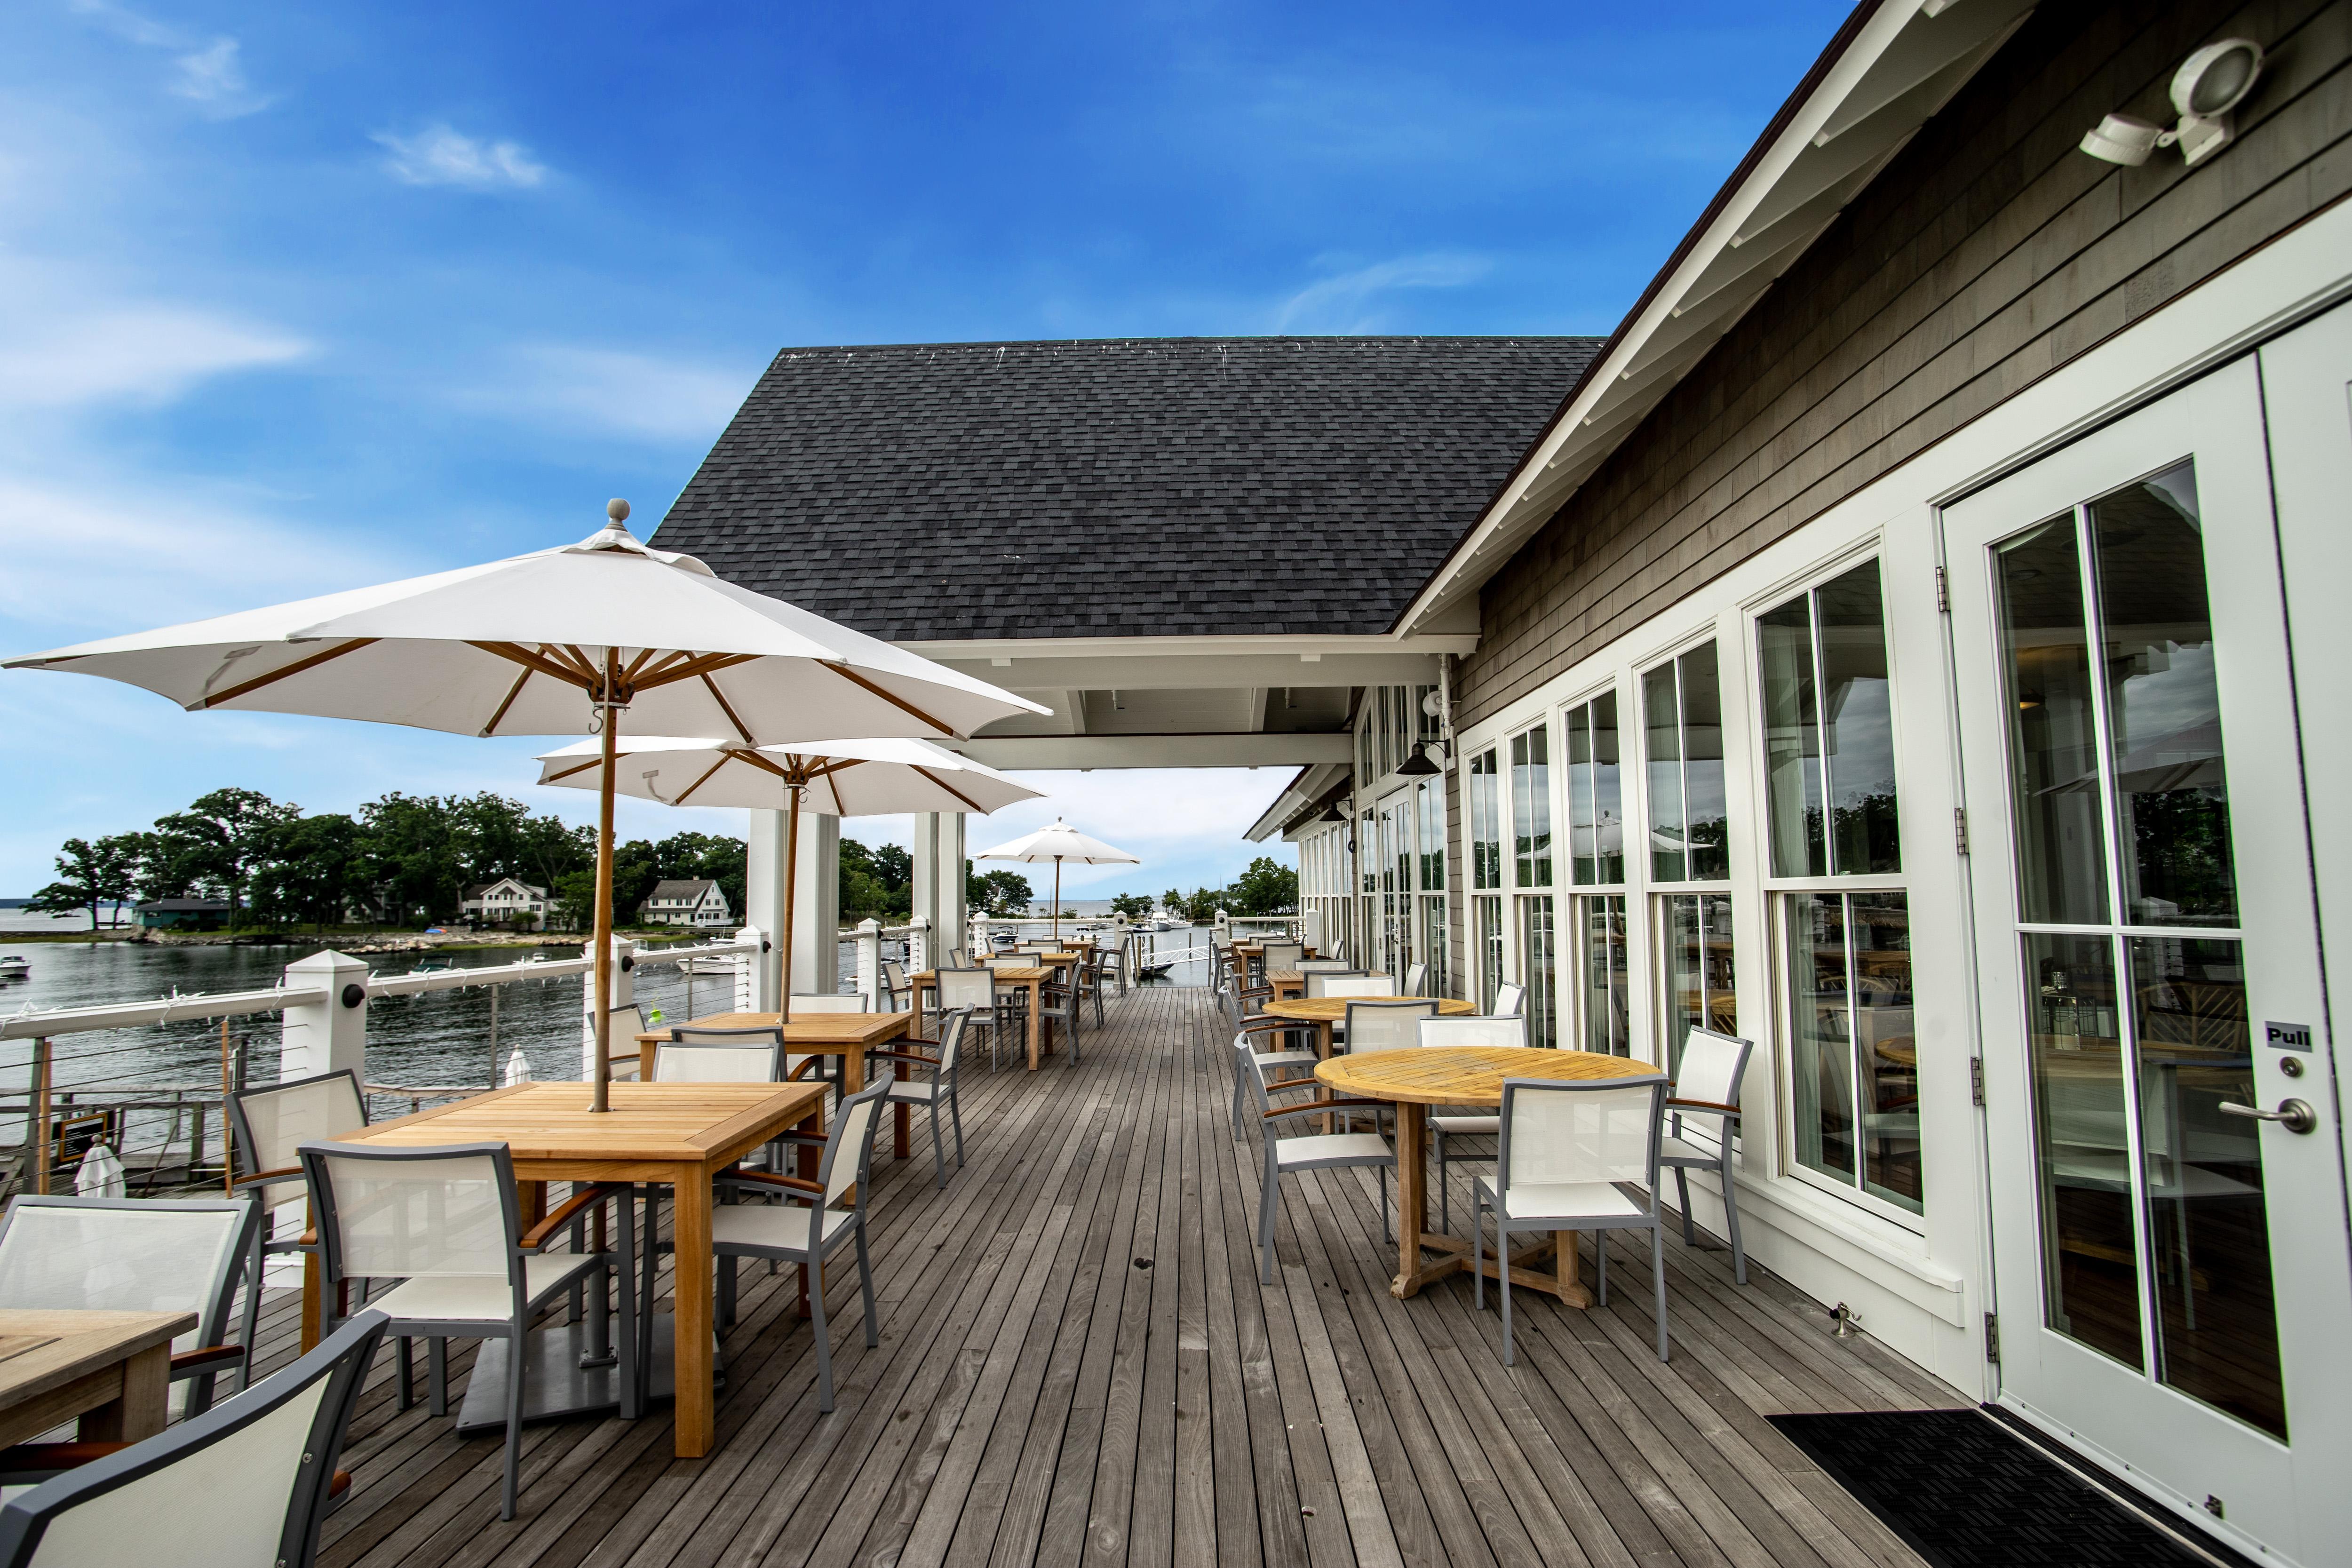 Noroton Yacht Club